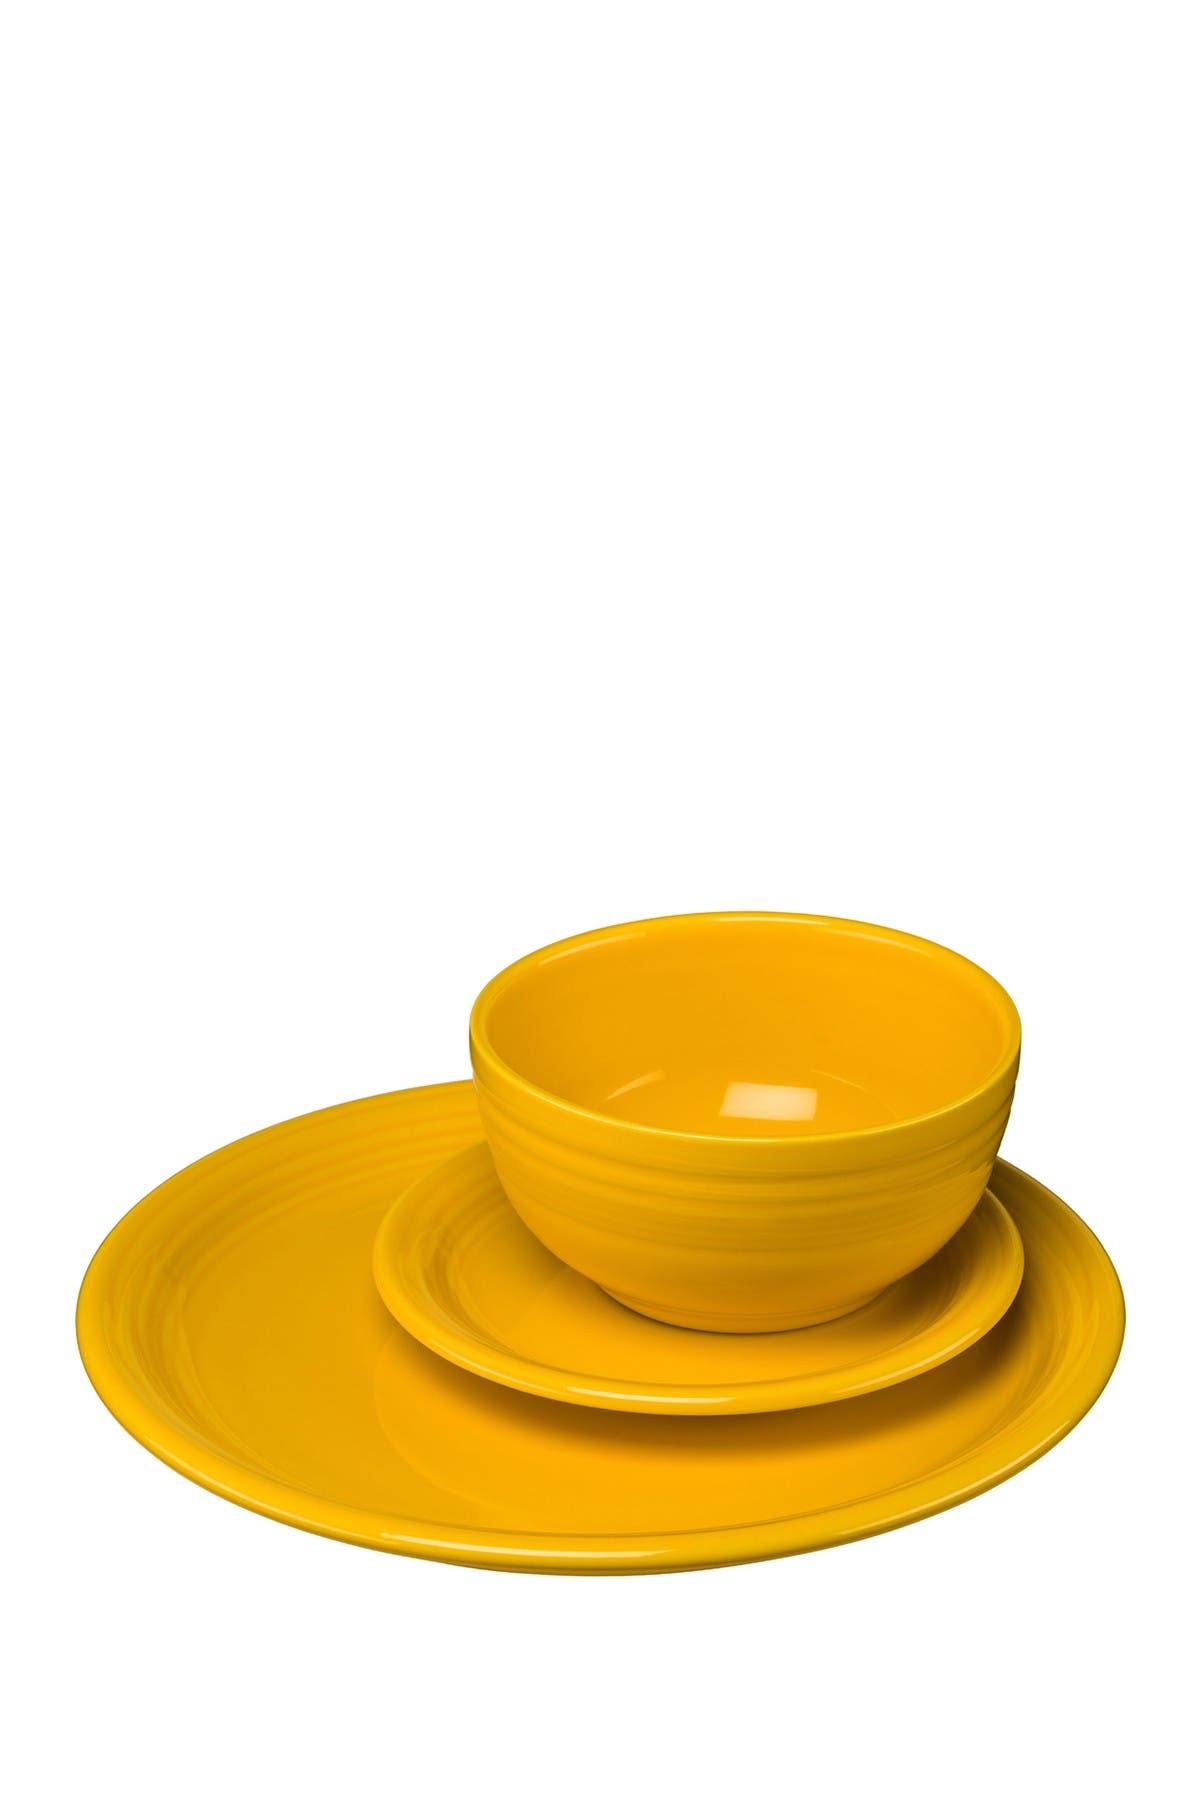 Image of Fiesta Tableware Company Bistro 3-Piece Set